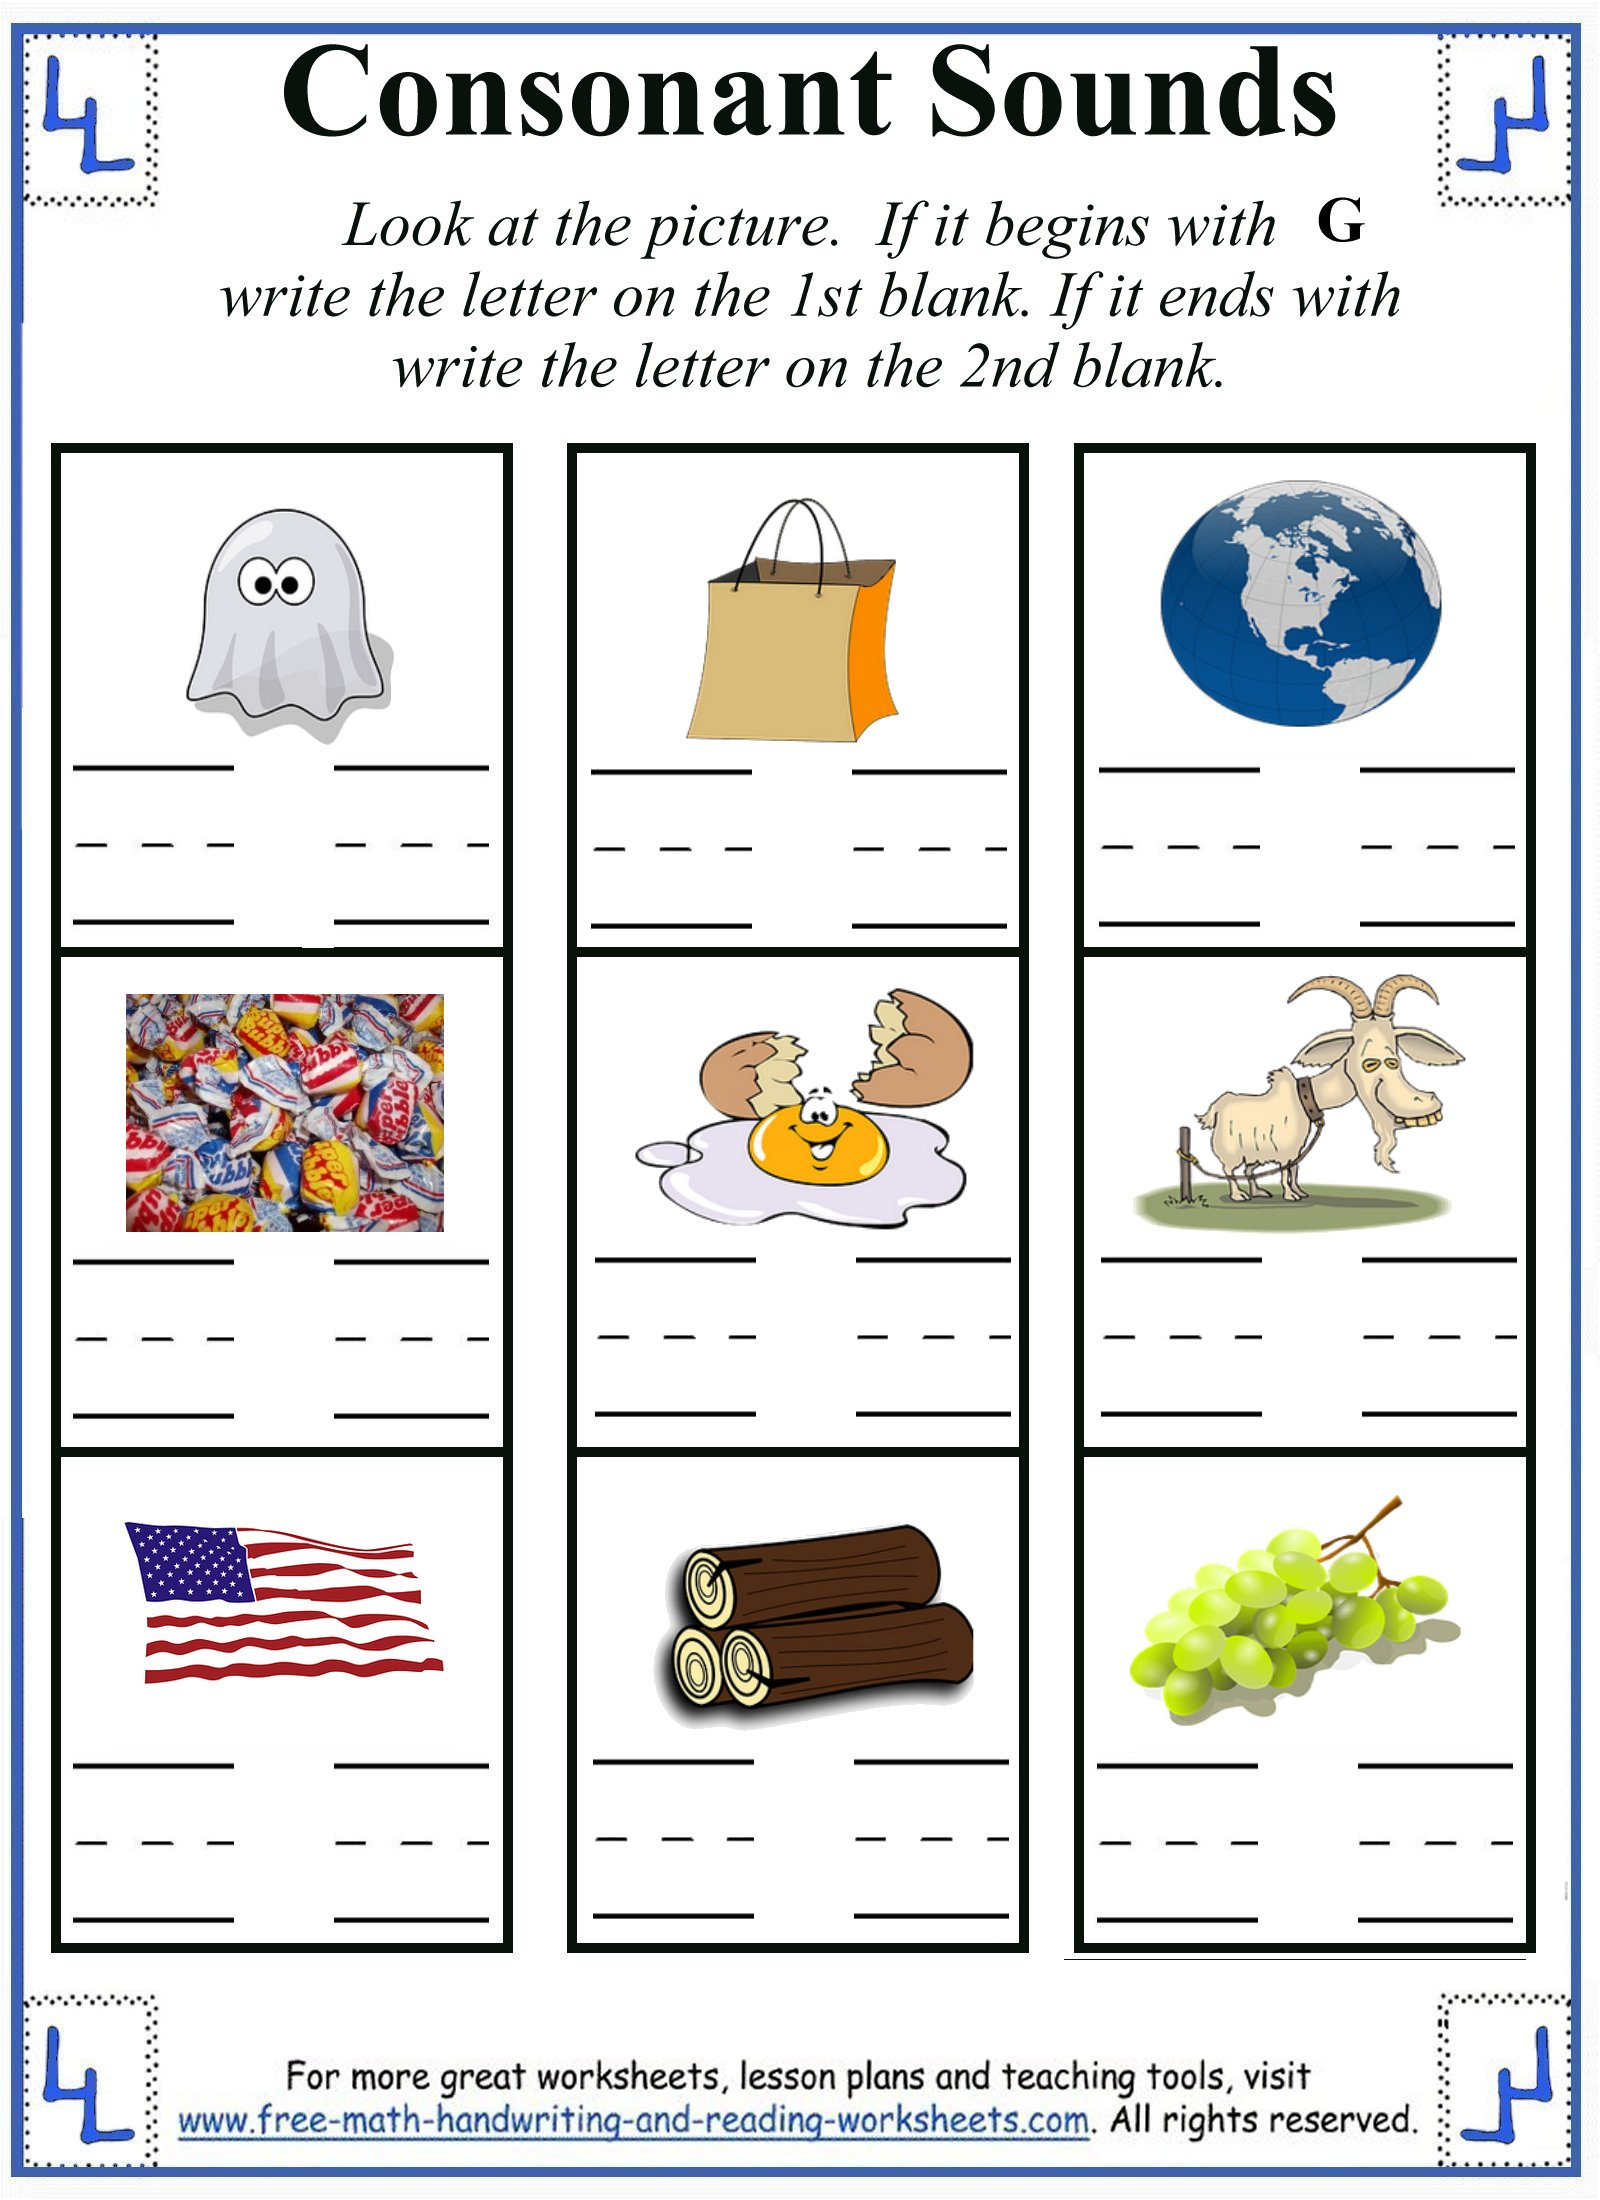 Letter G Worksheet Activities intended for Letter G Worksheets For First Grade